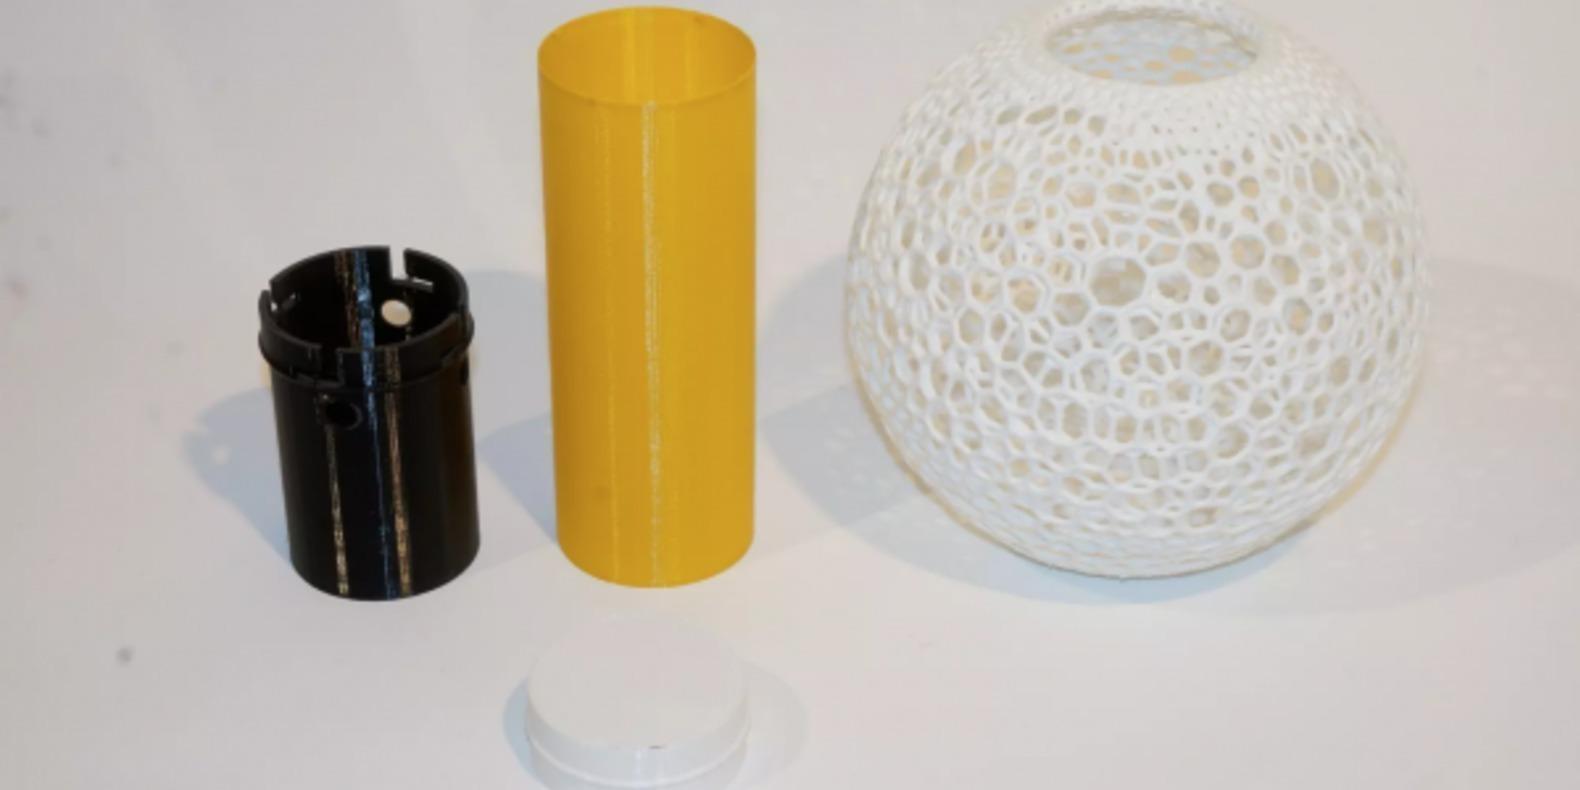 lampe sino makemakemake impression 3D fichier 3D cults 2